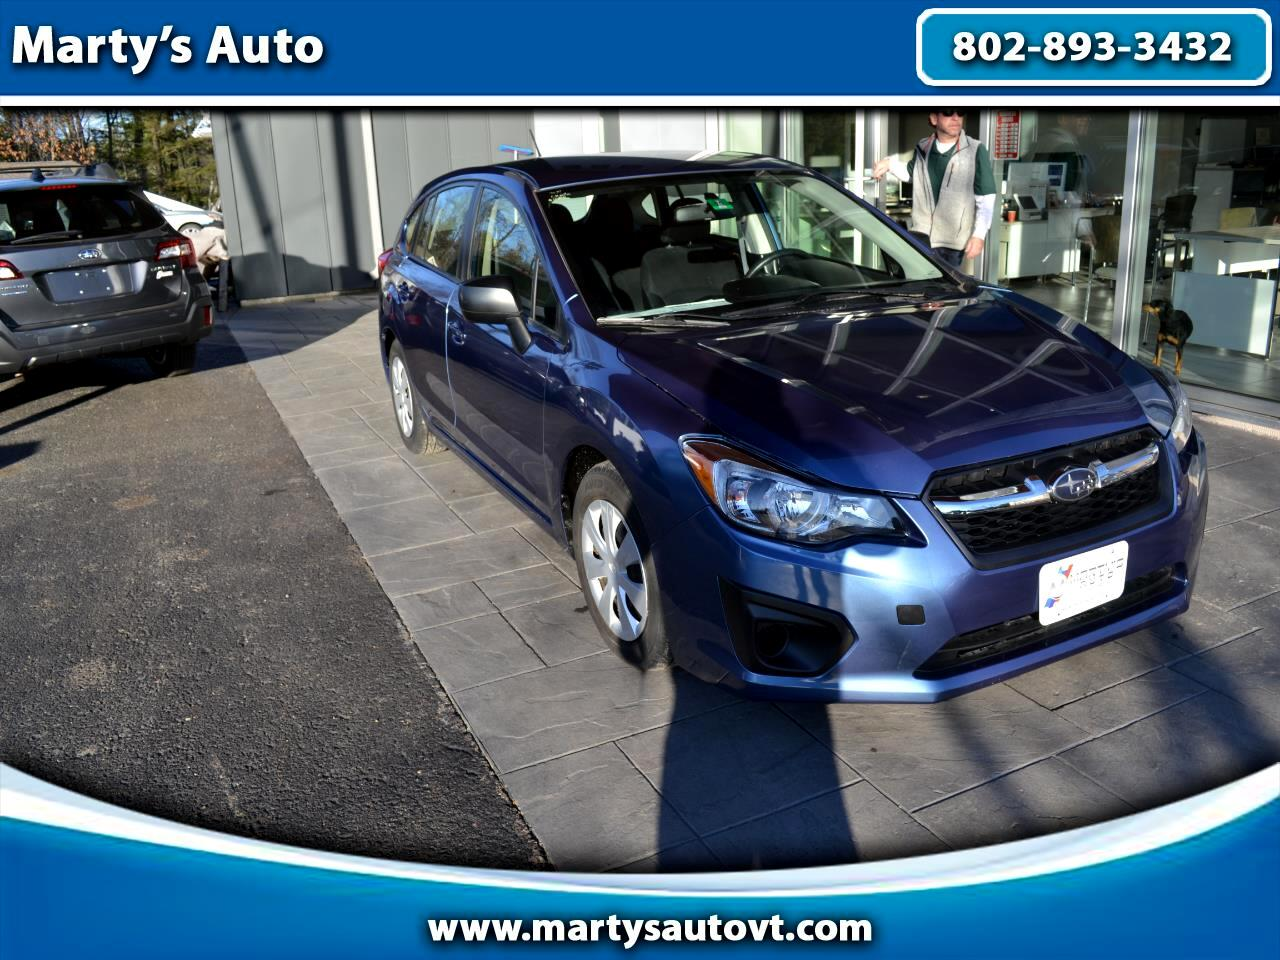 2014 Subaru Impreza 5dr Auto 2.0i